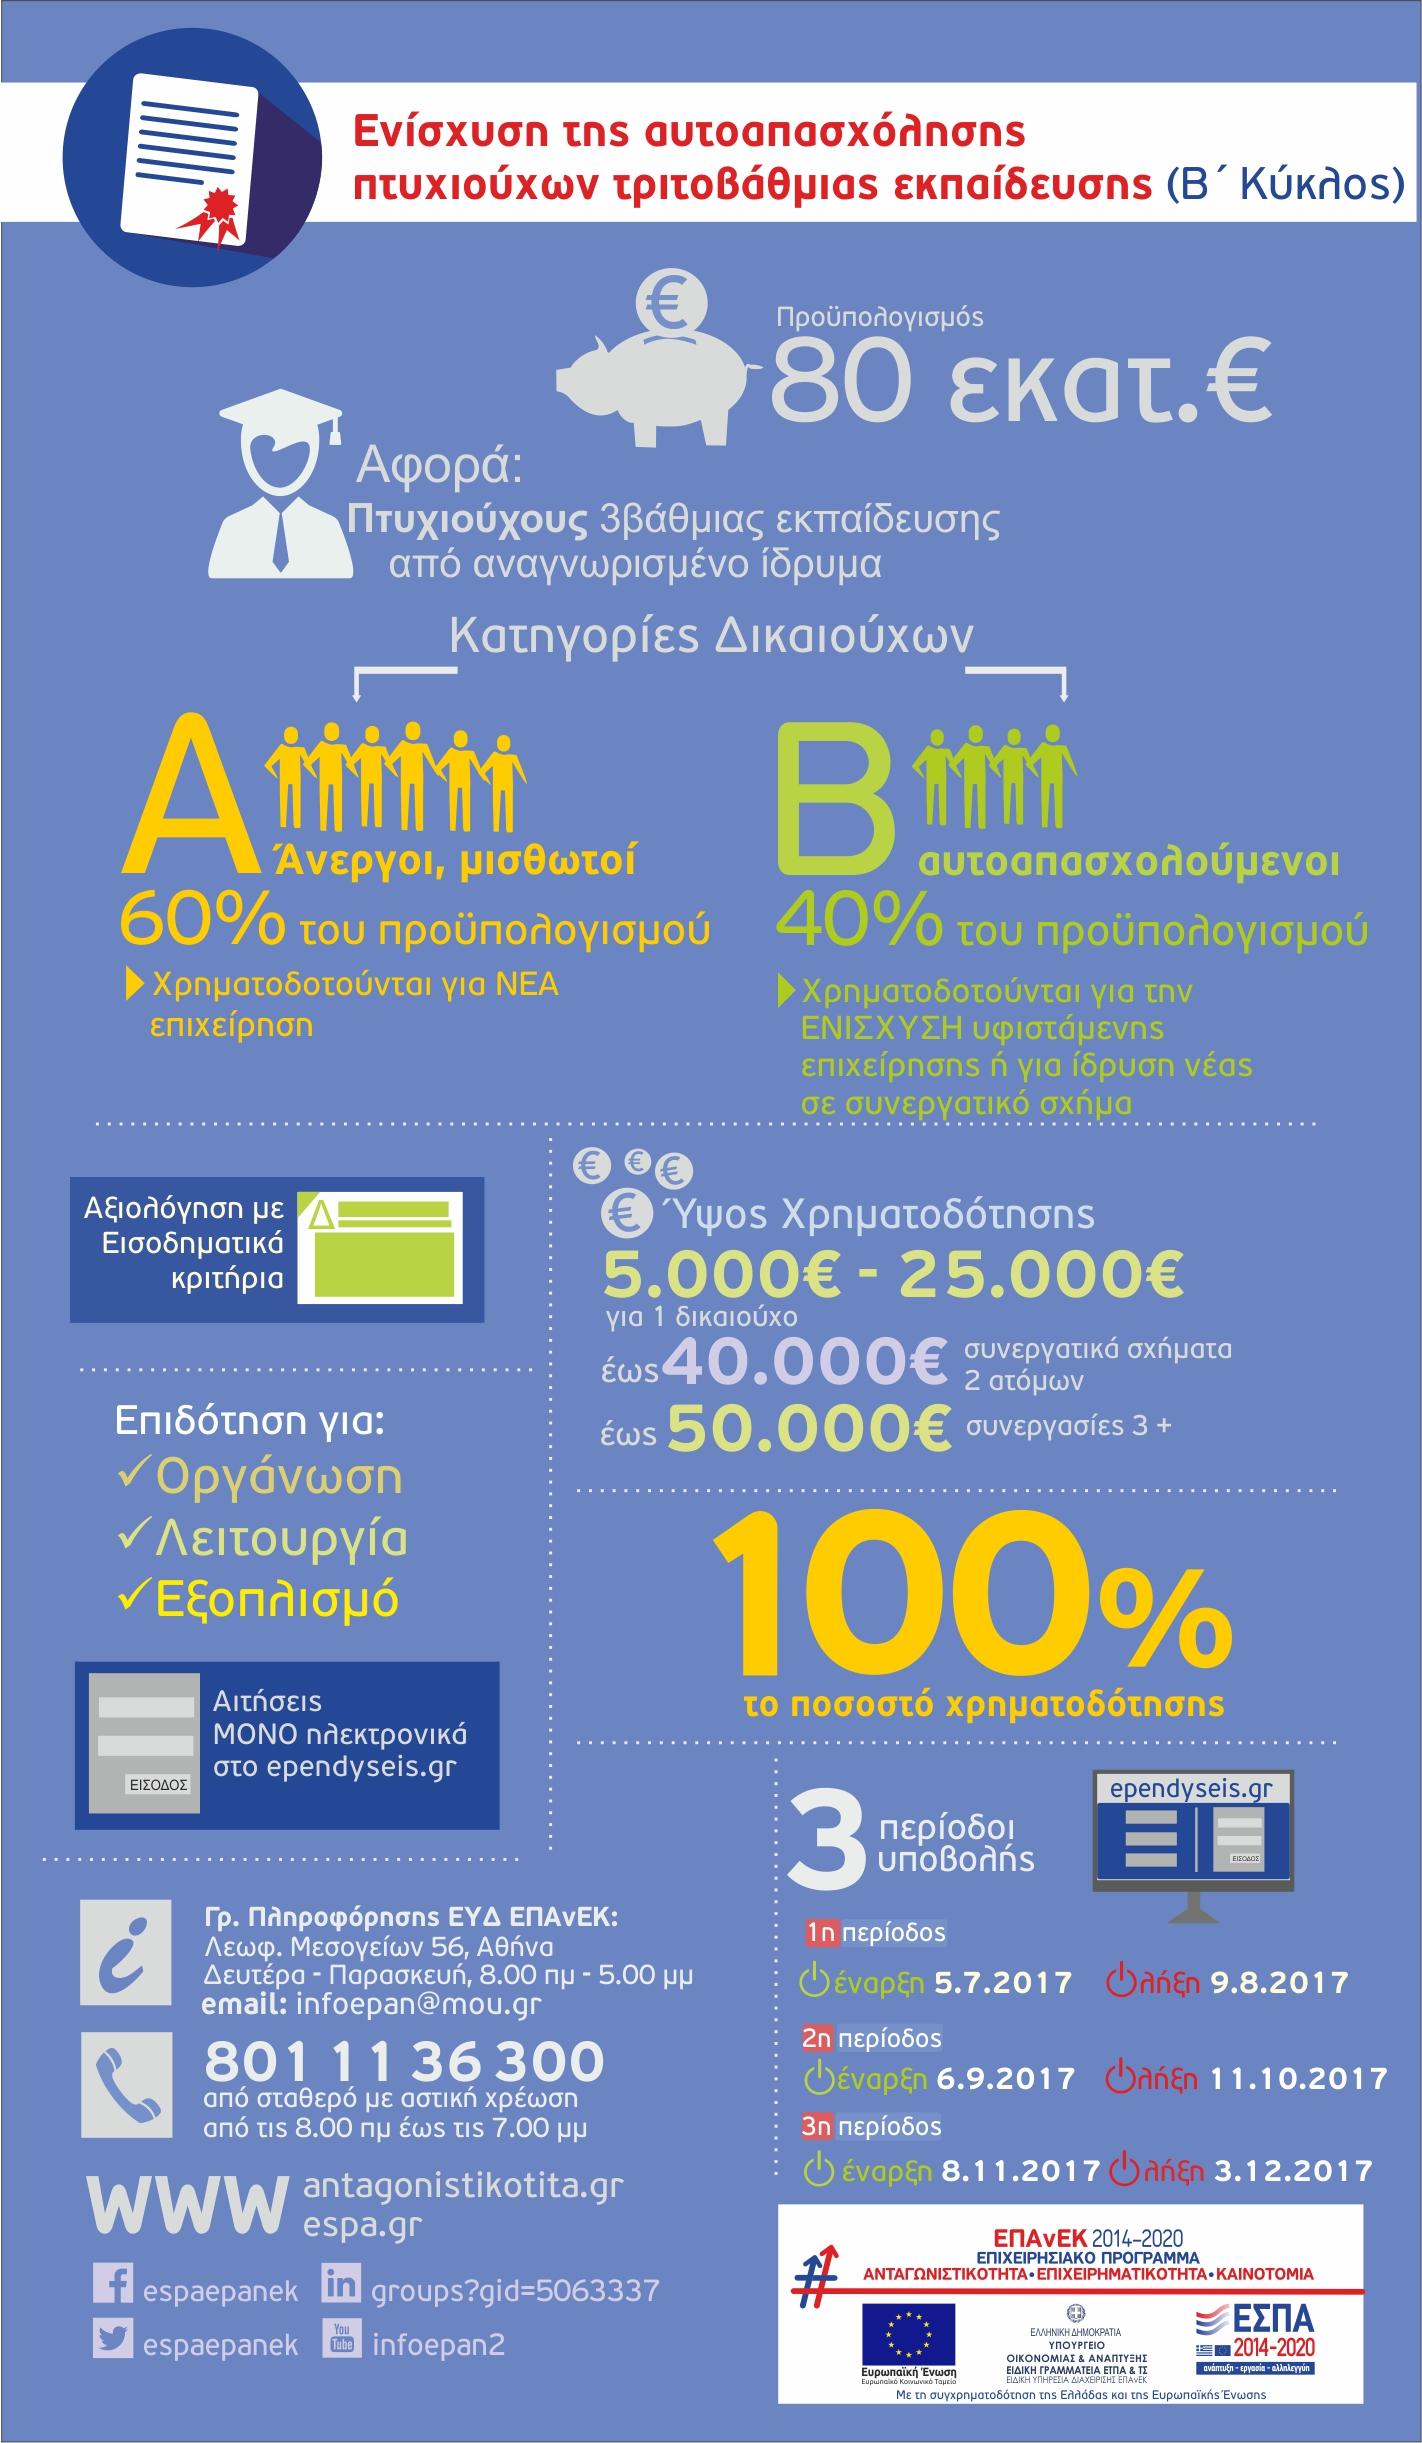 b_infographicf%ce%b9%ce%bd%ce%b1l